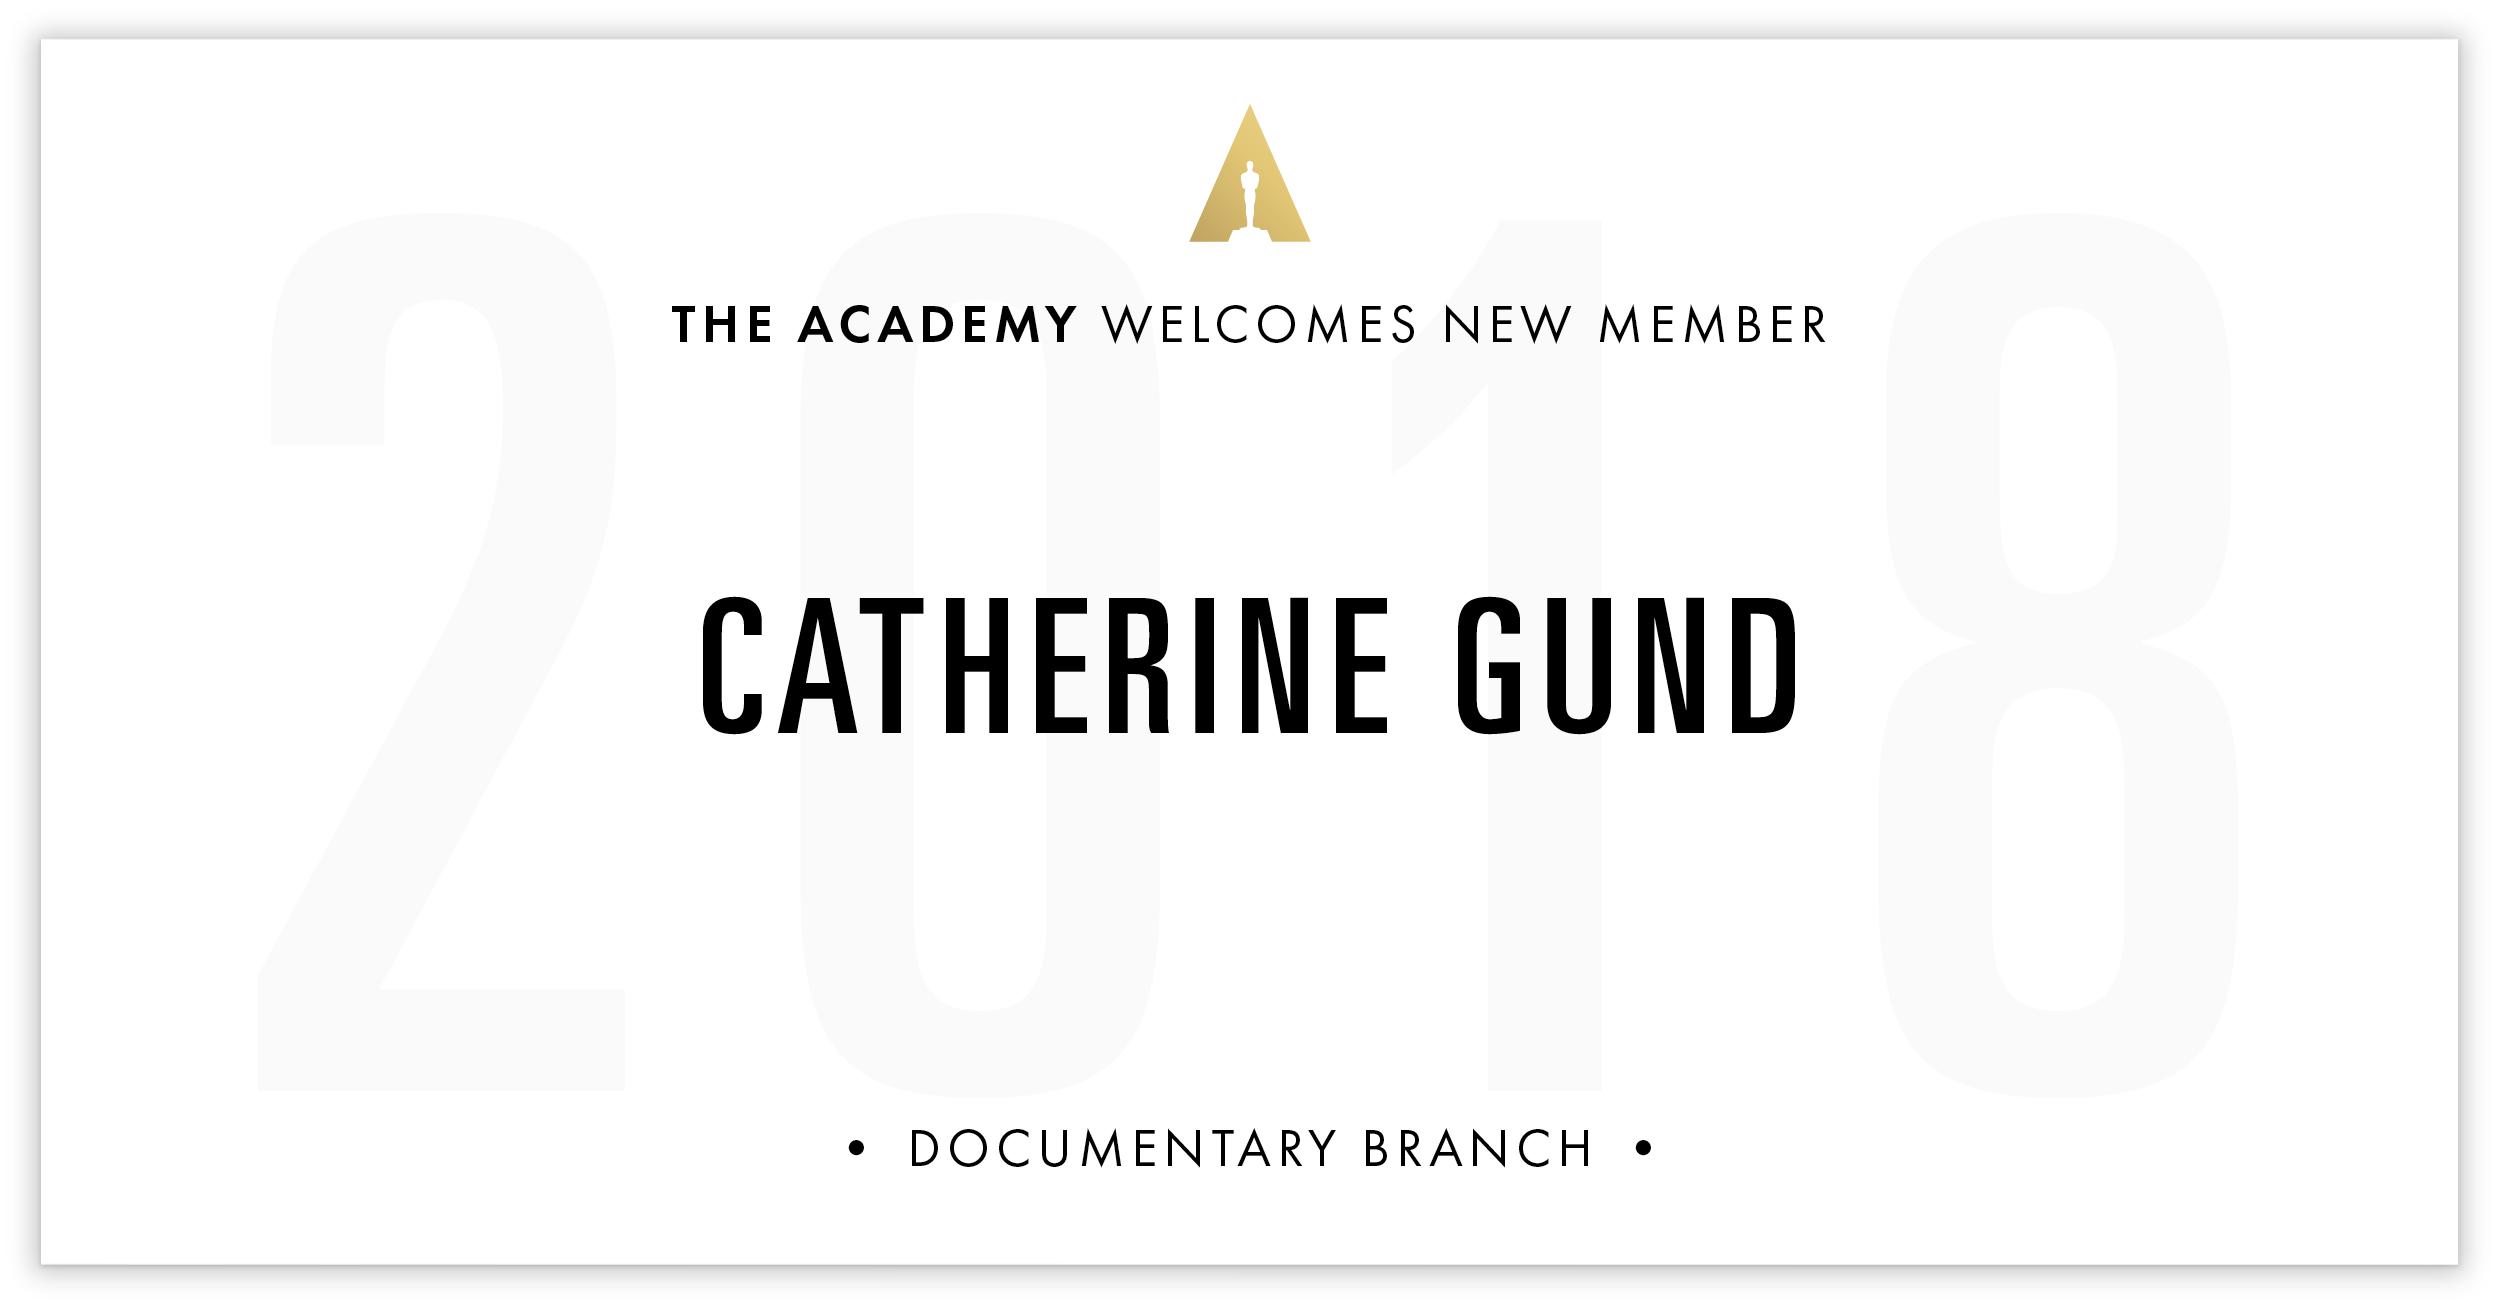 Catherine Gund is invited!